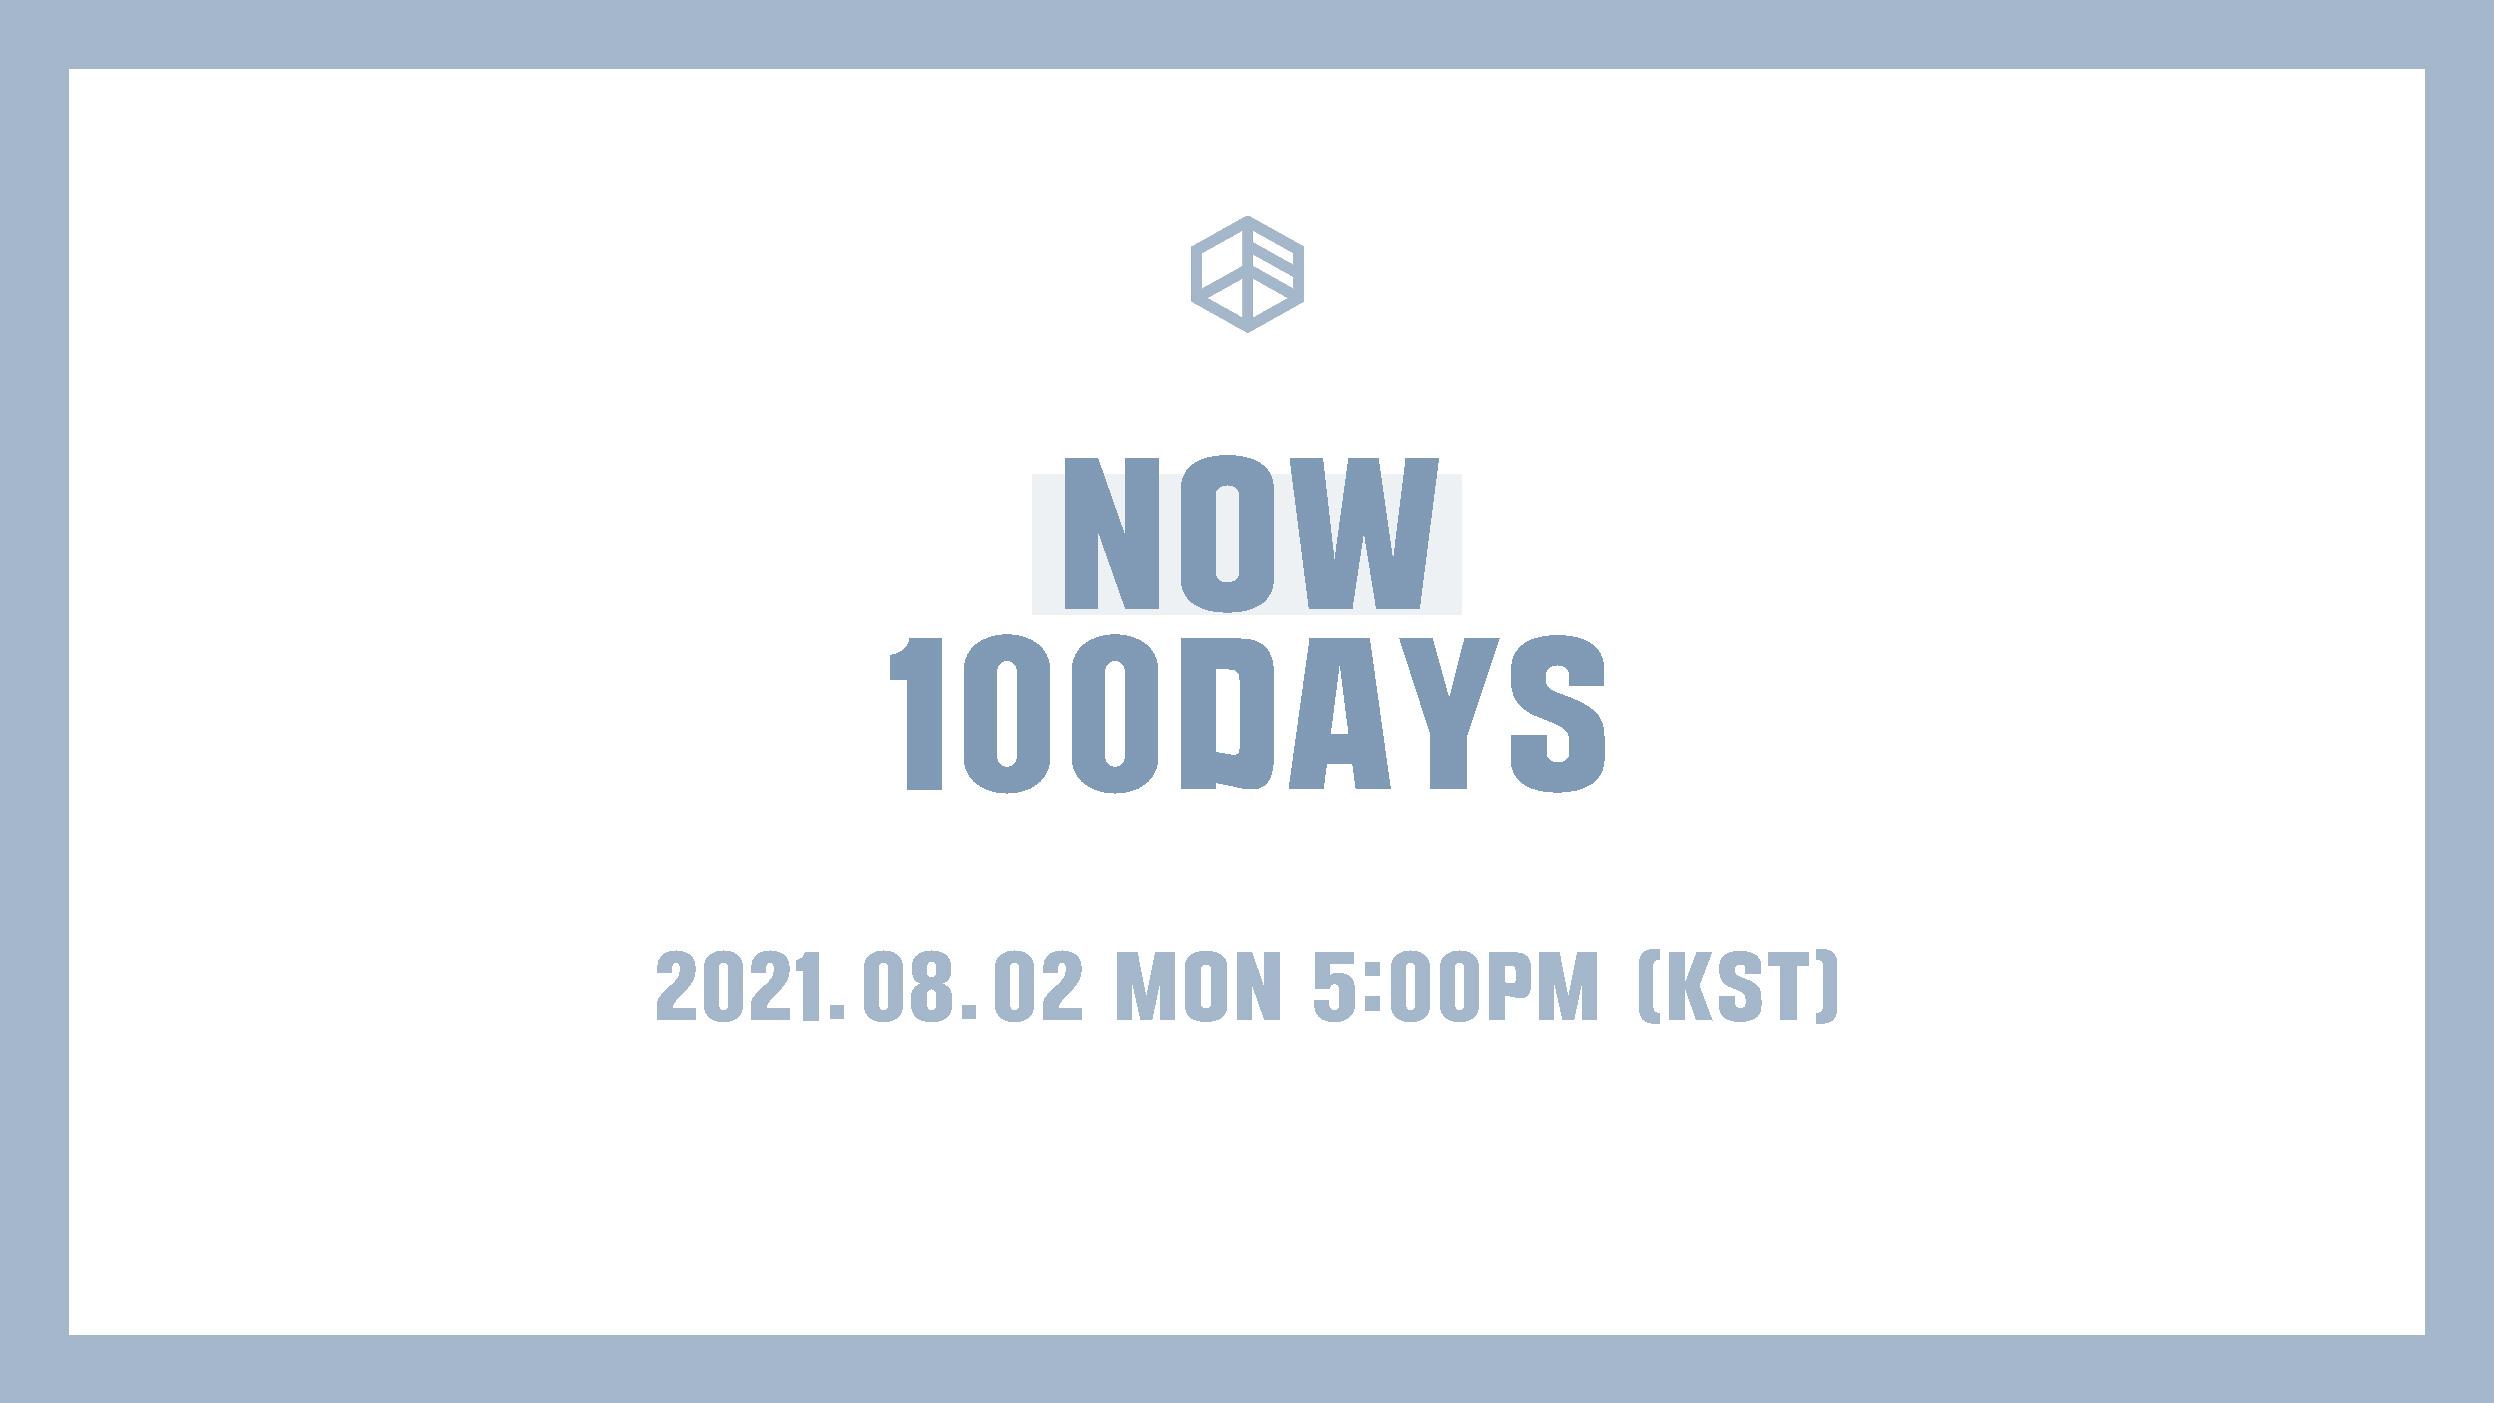 🎉 NOW 100DAYS 🎉